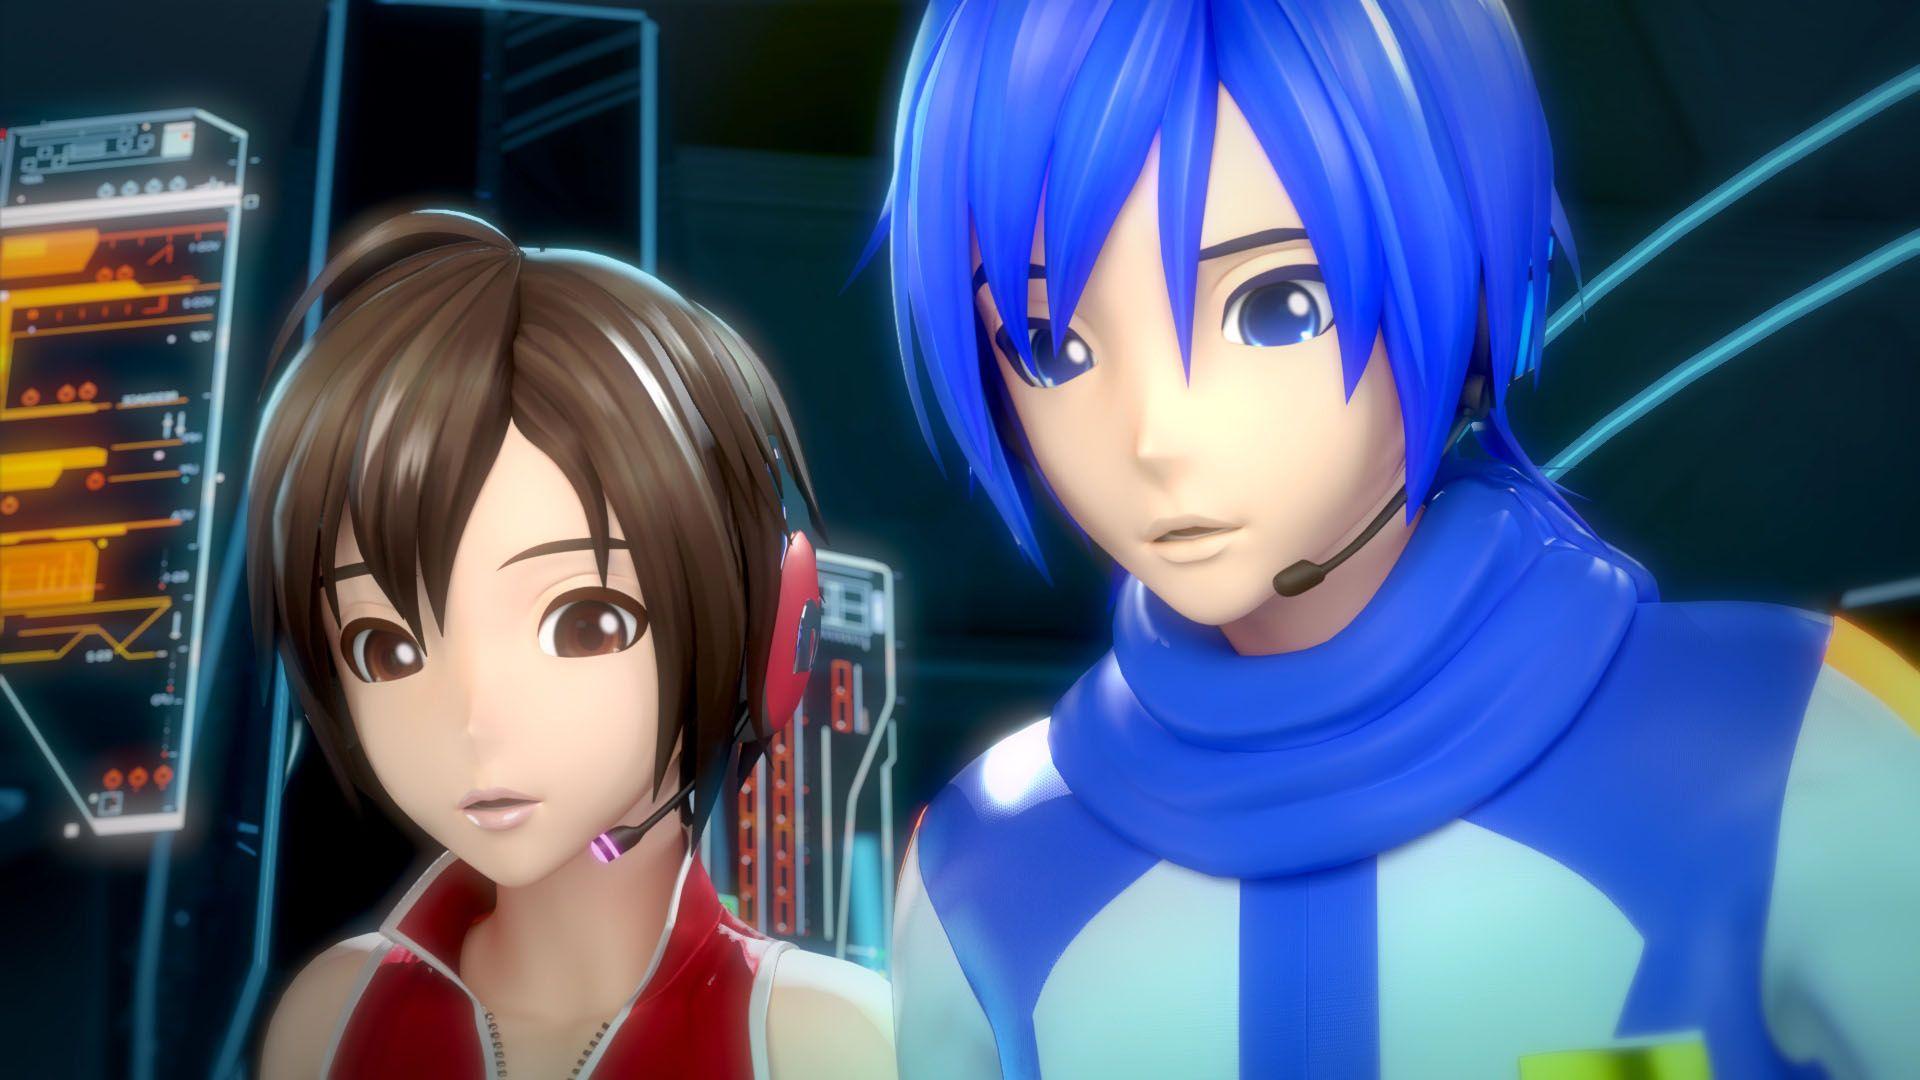 kaito+project+diva+f+wink | Hatsune Miku: Project Diva F 2nd terá um controle de Arcade no Japão ... Kaito